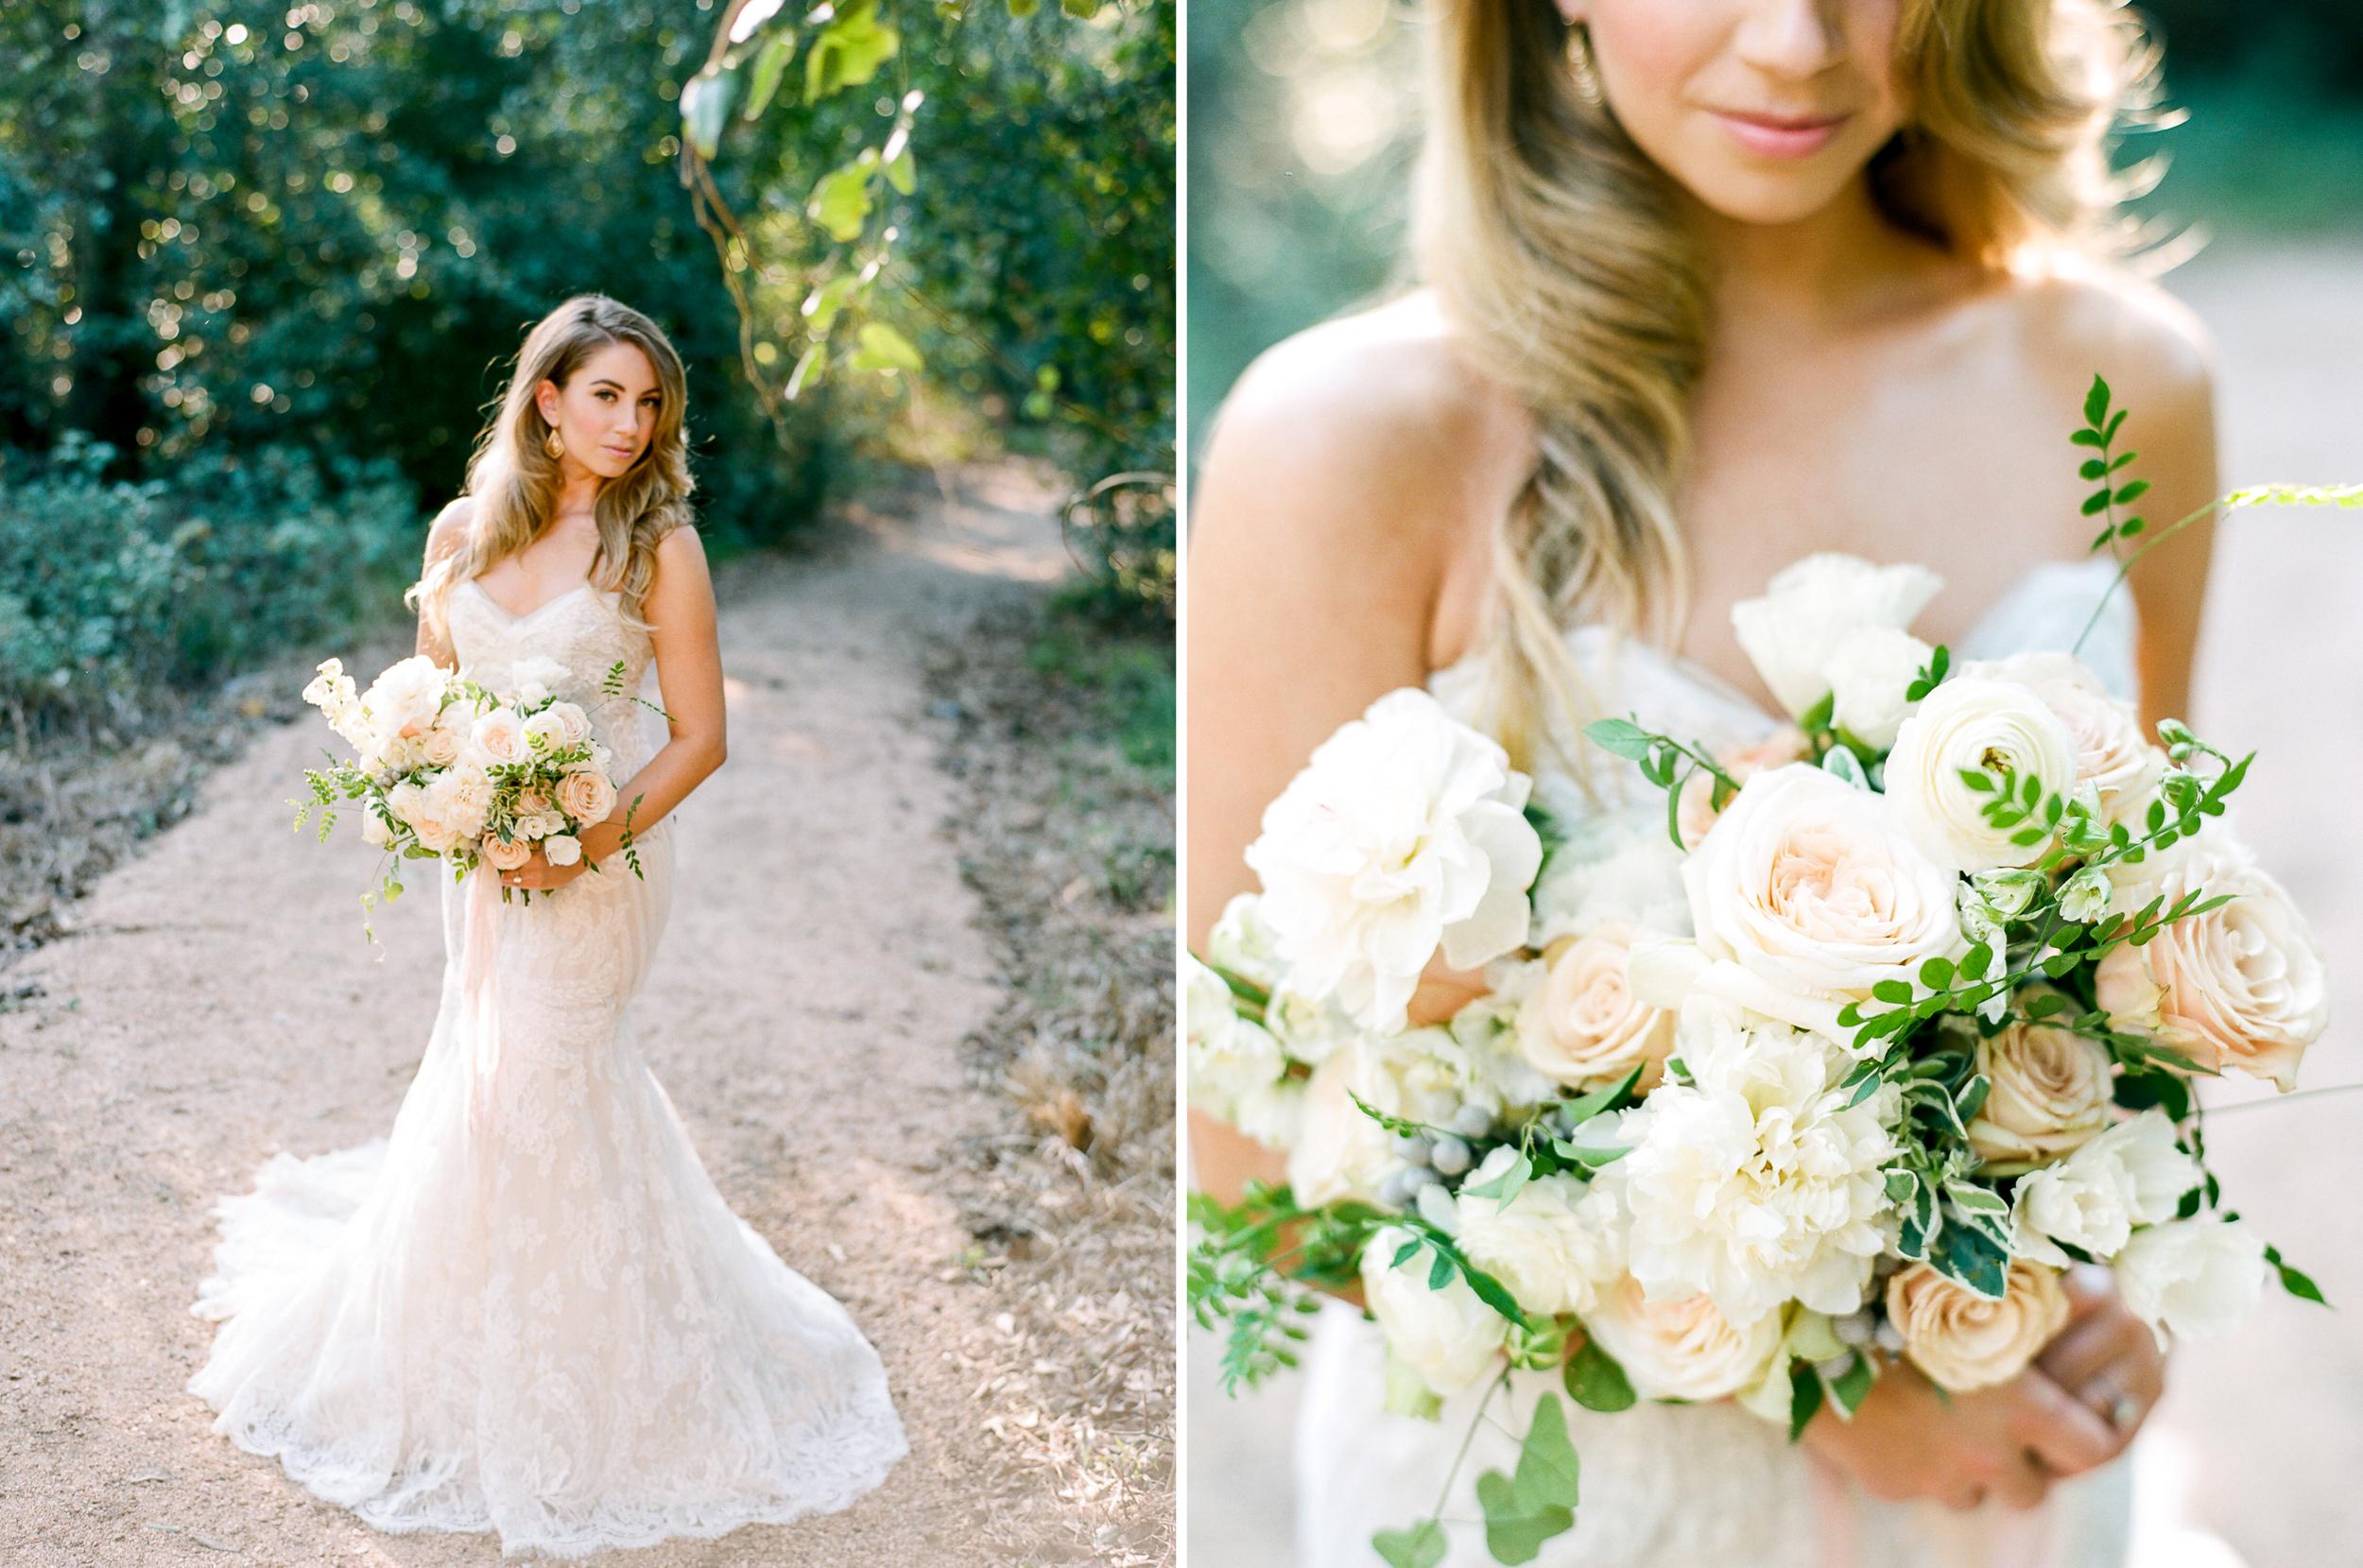 dana-fernandez-photography-the-wedding-chicks-film-houston-wedding-photography-destination-121.jpg